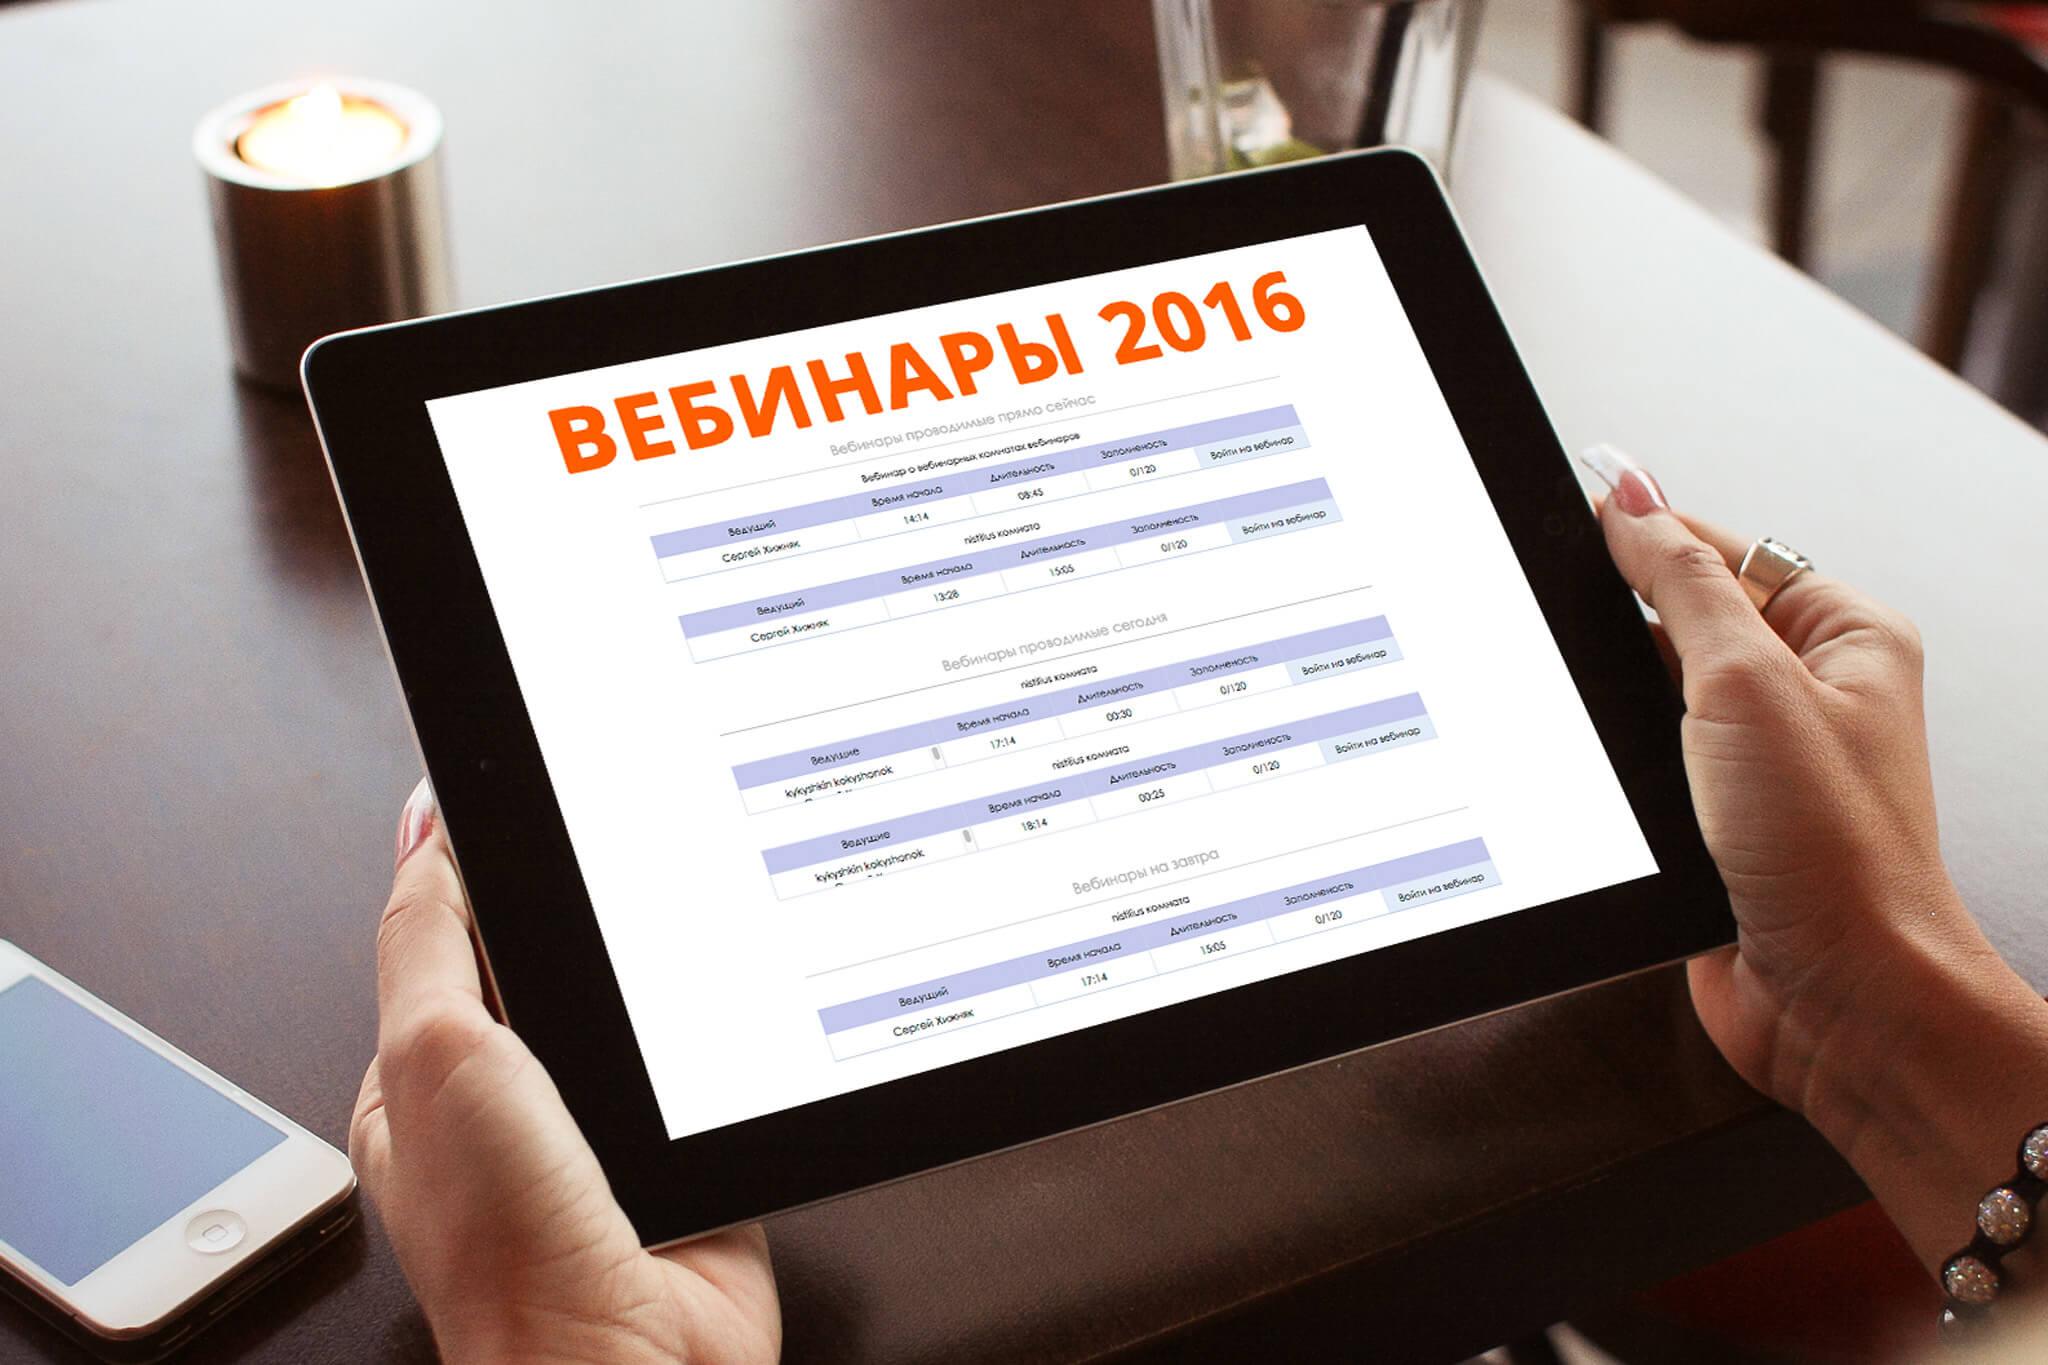 webinars 2016